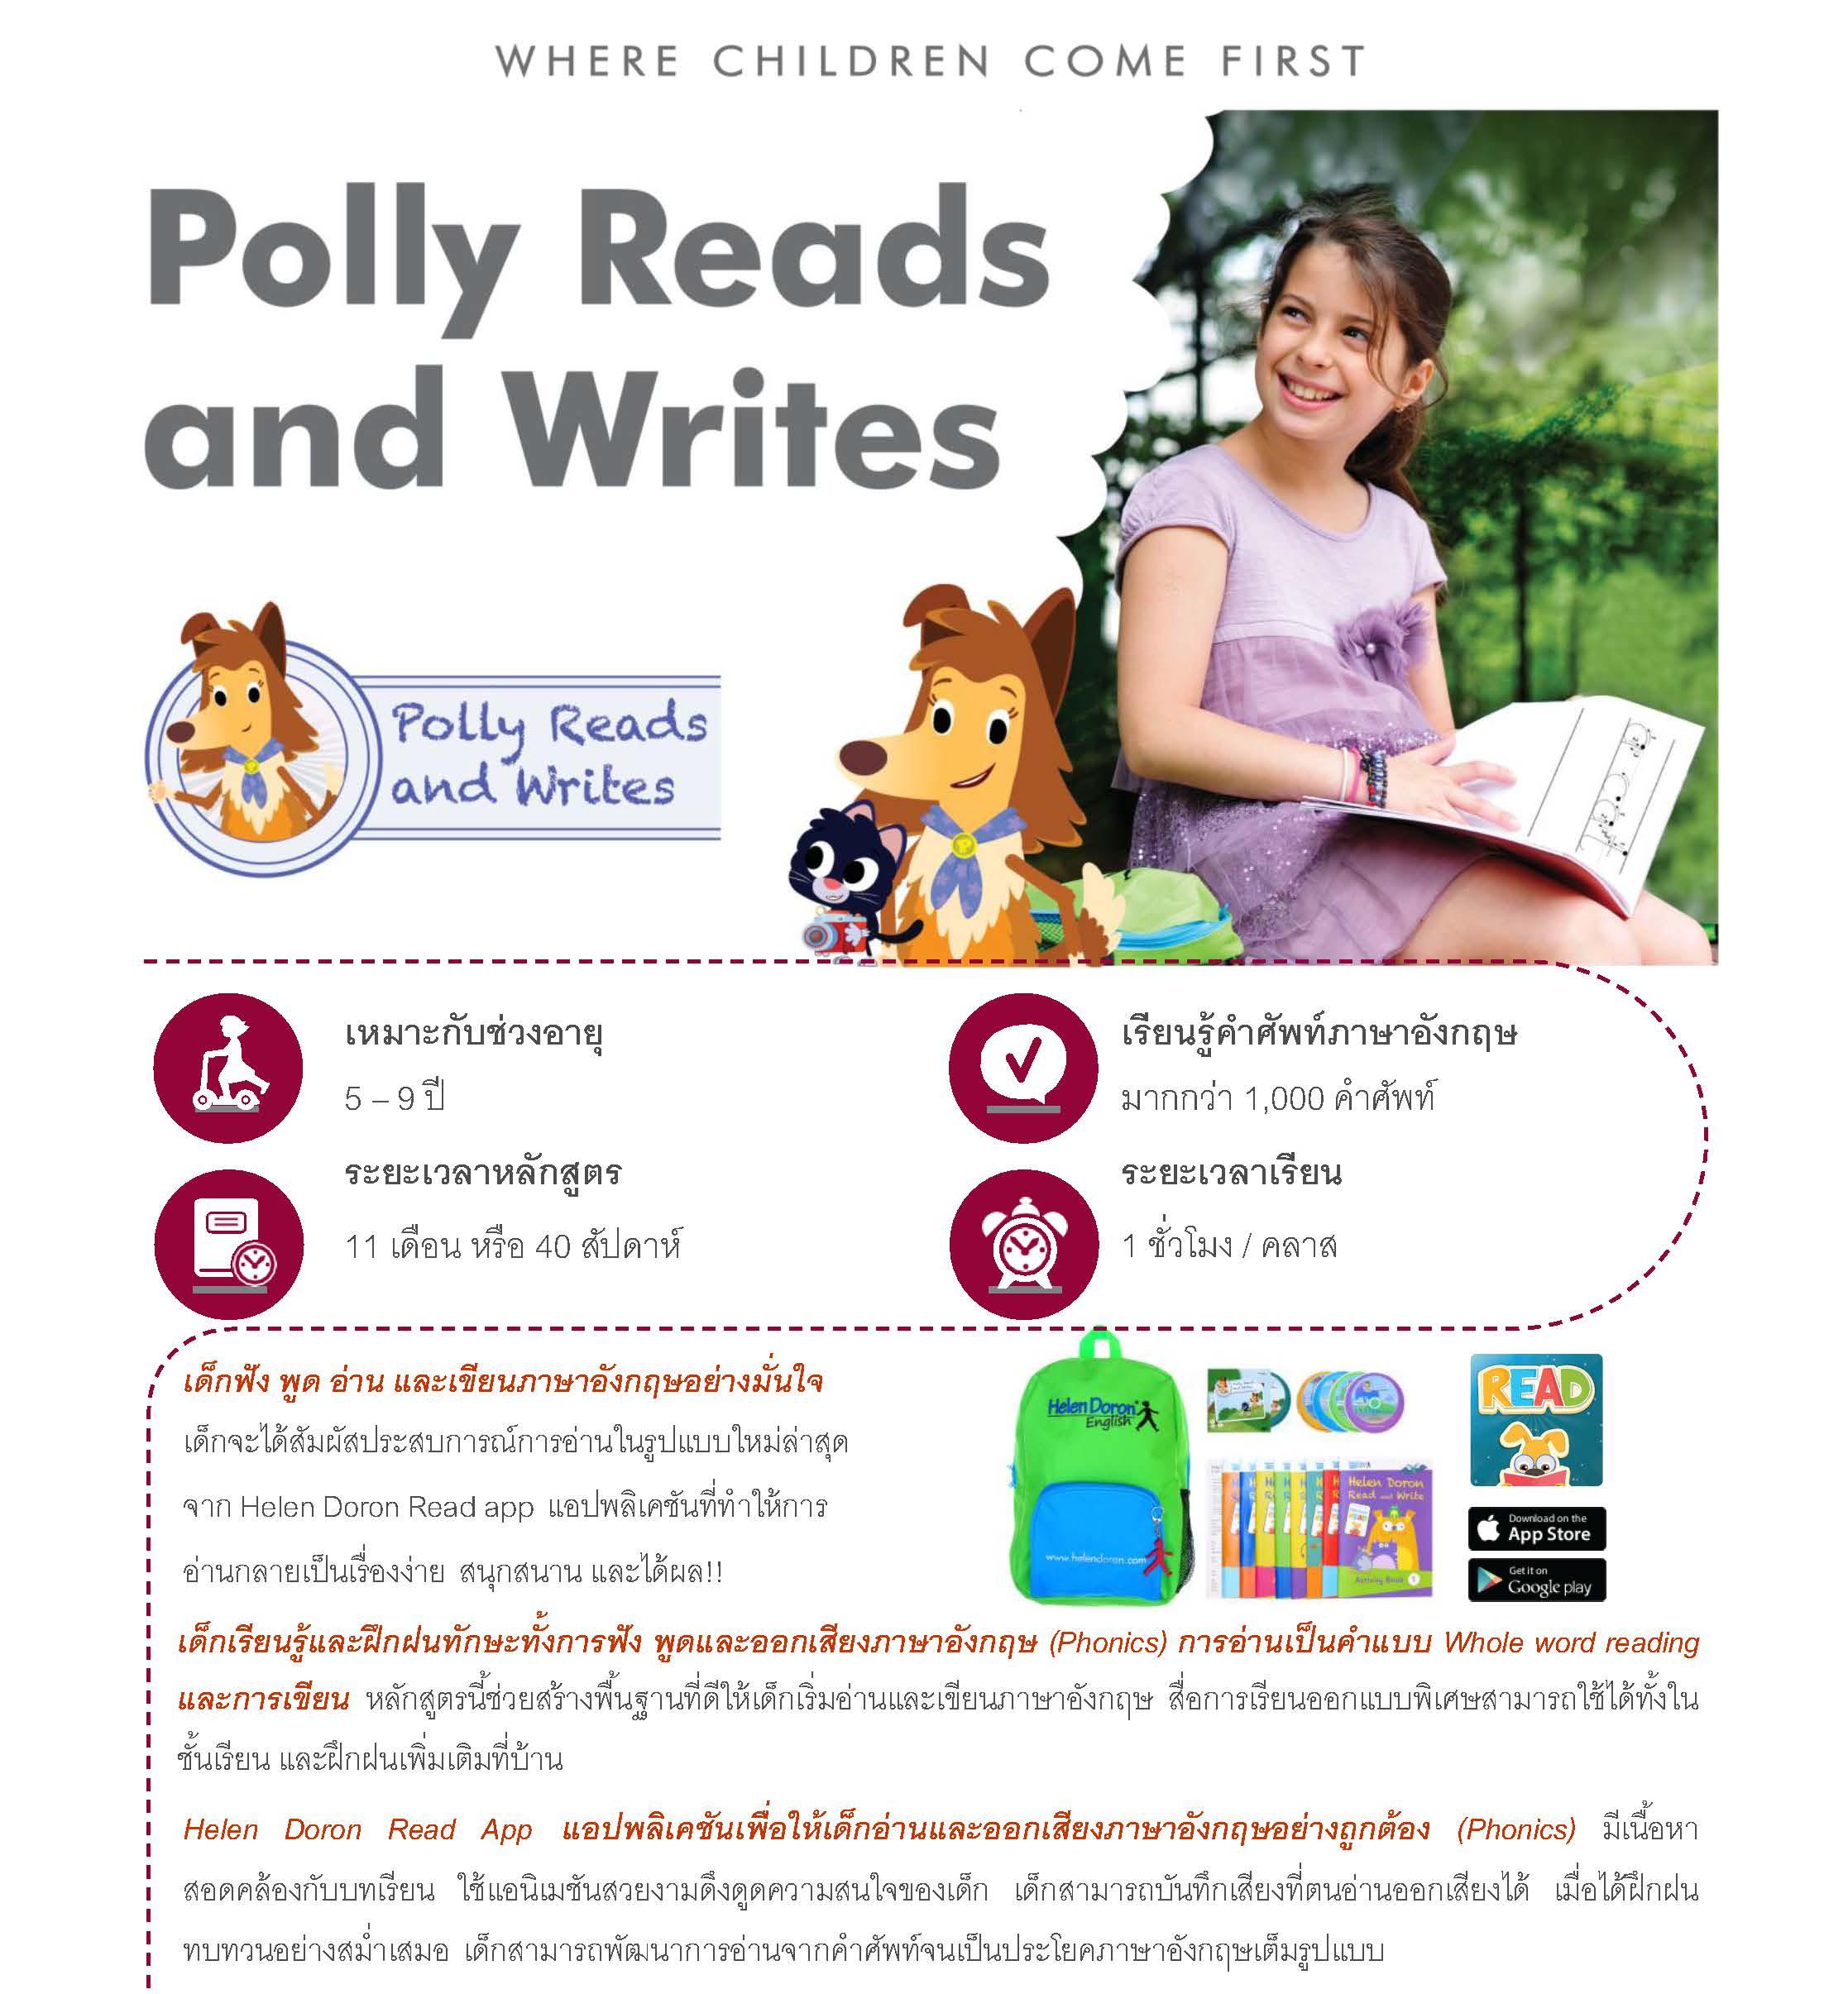 Download - Polly Reads and Writes สำหรับเด็กอายุ 5 - 9 ปี